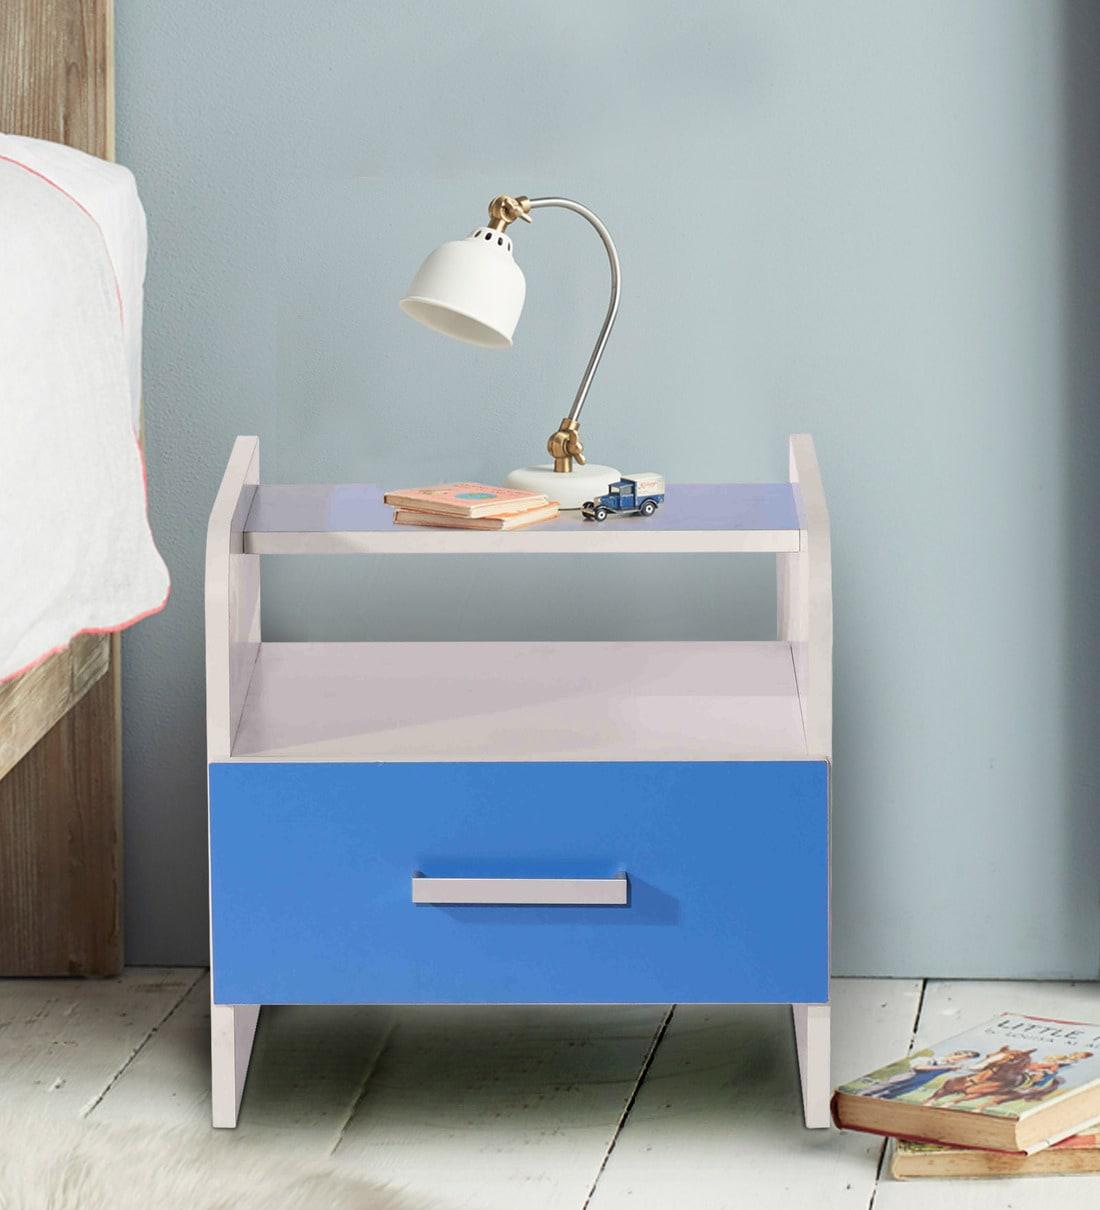 Buy Aqua Splash Bedside Table In White Blue Finish Mintwud By Pepperfry Online Kids Bedside Tables Kids Furniture Kids Furniture Pepperfry Product